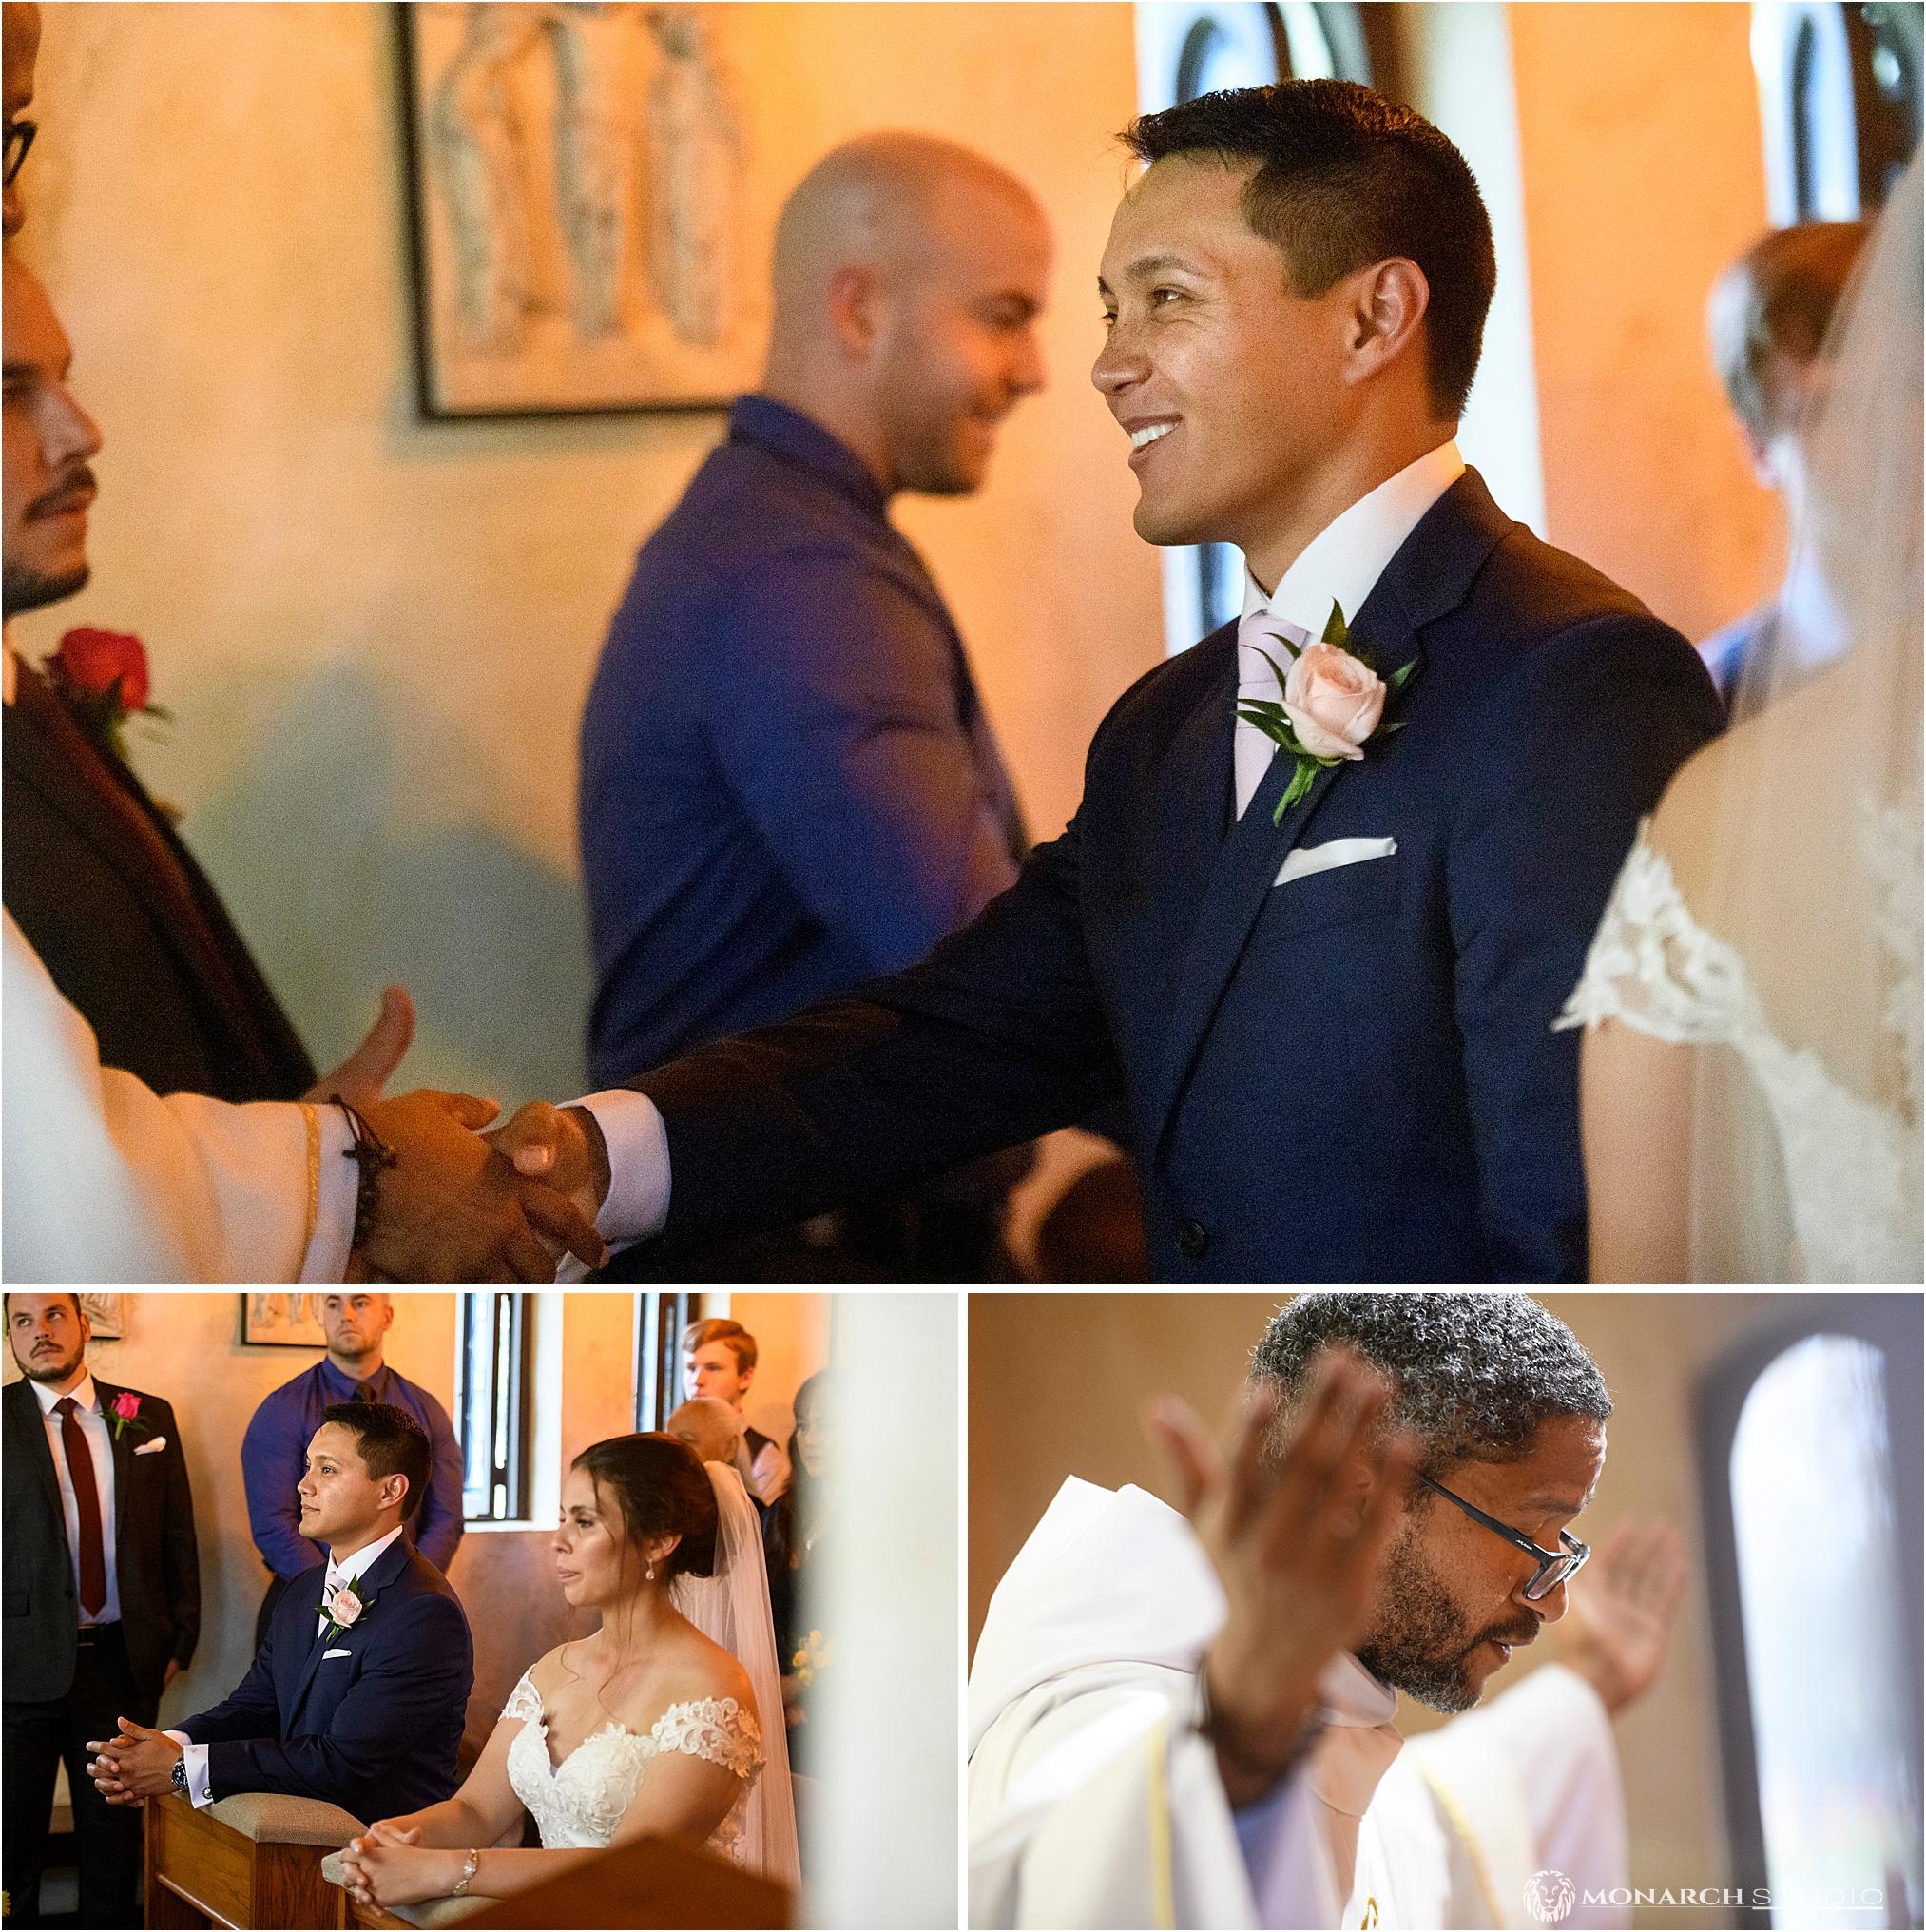 st-augustine-catholic-wedding-054.jpg